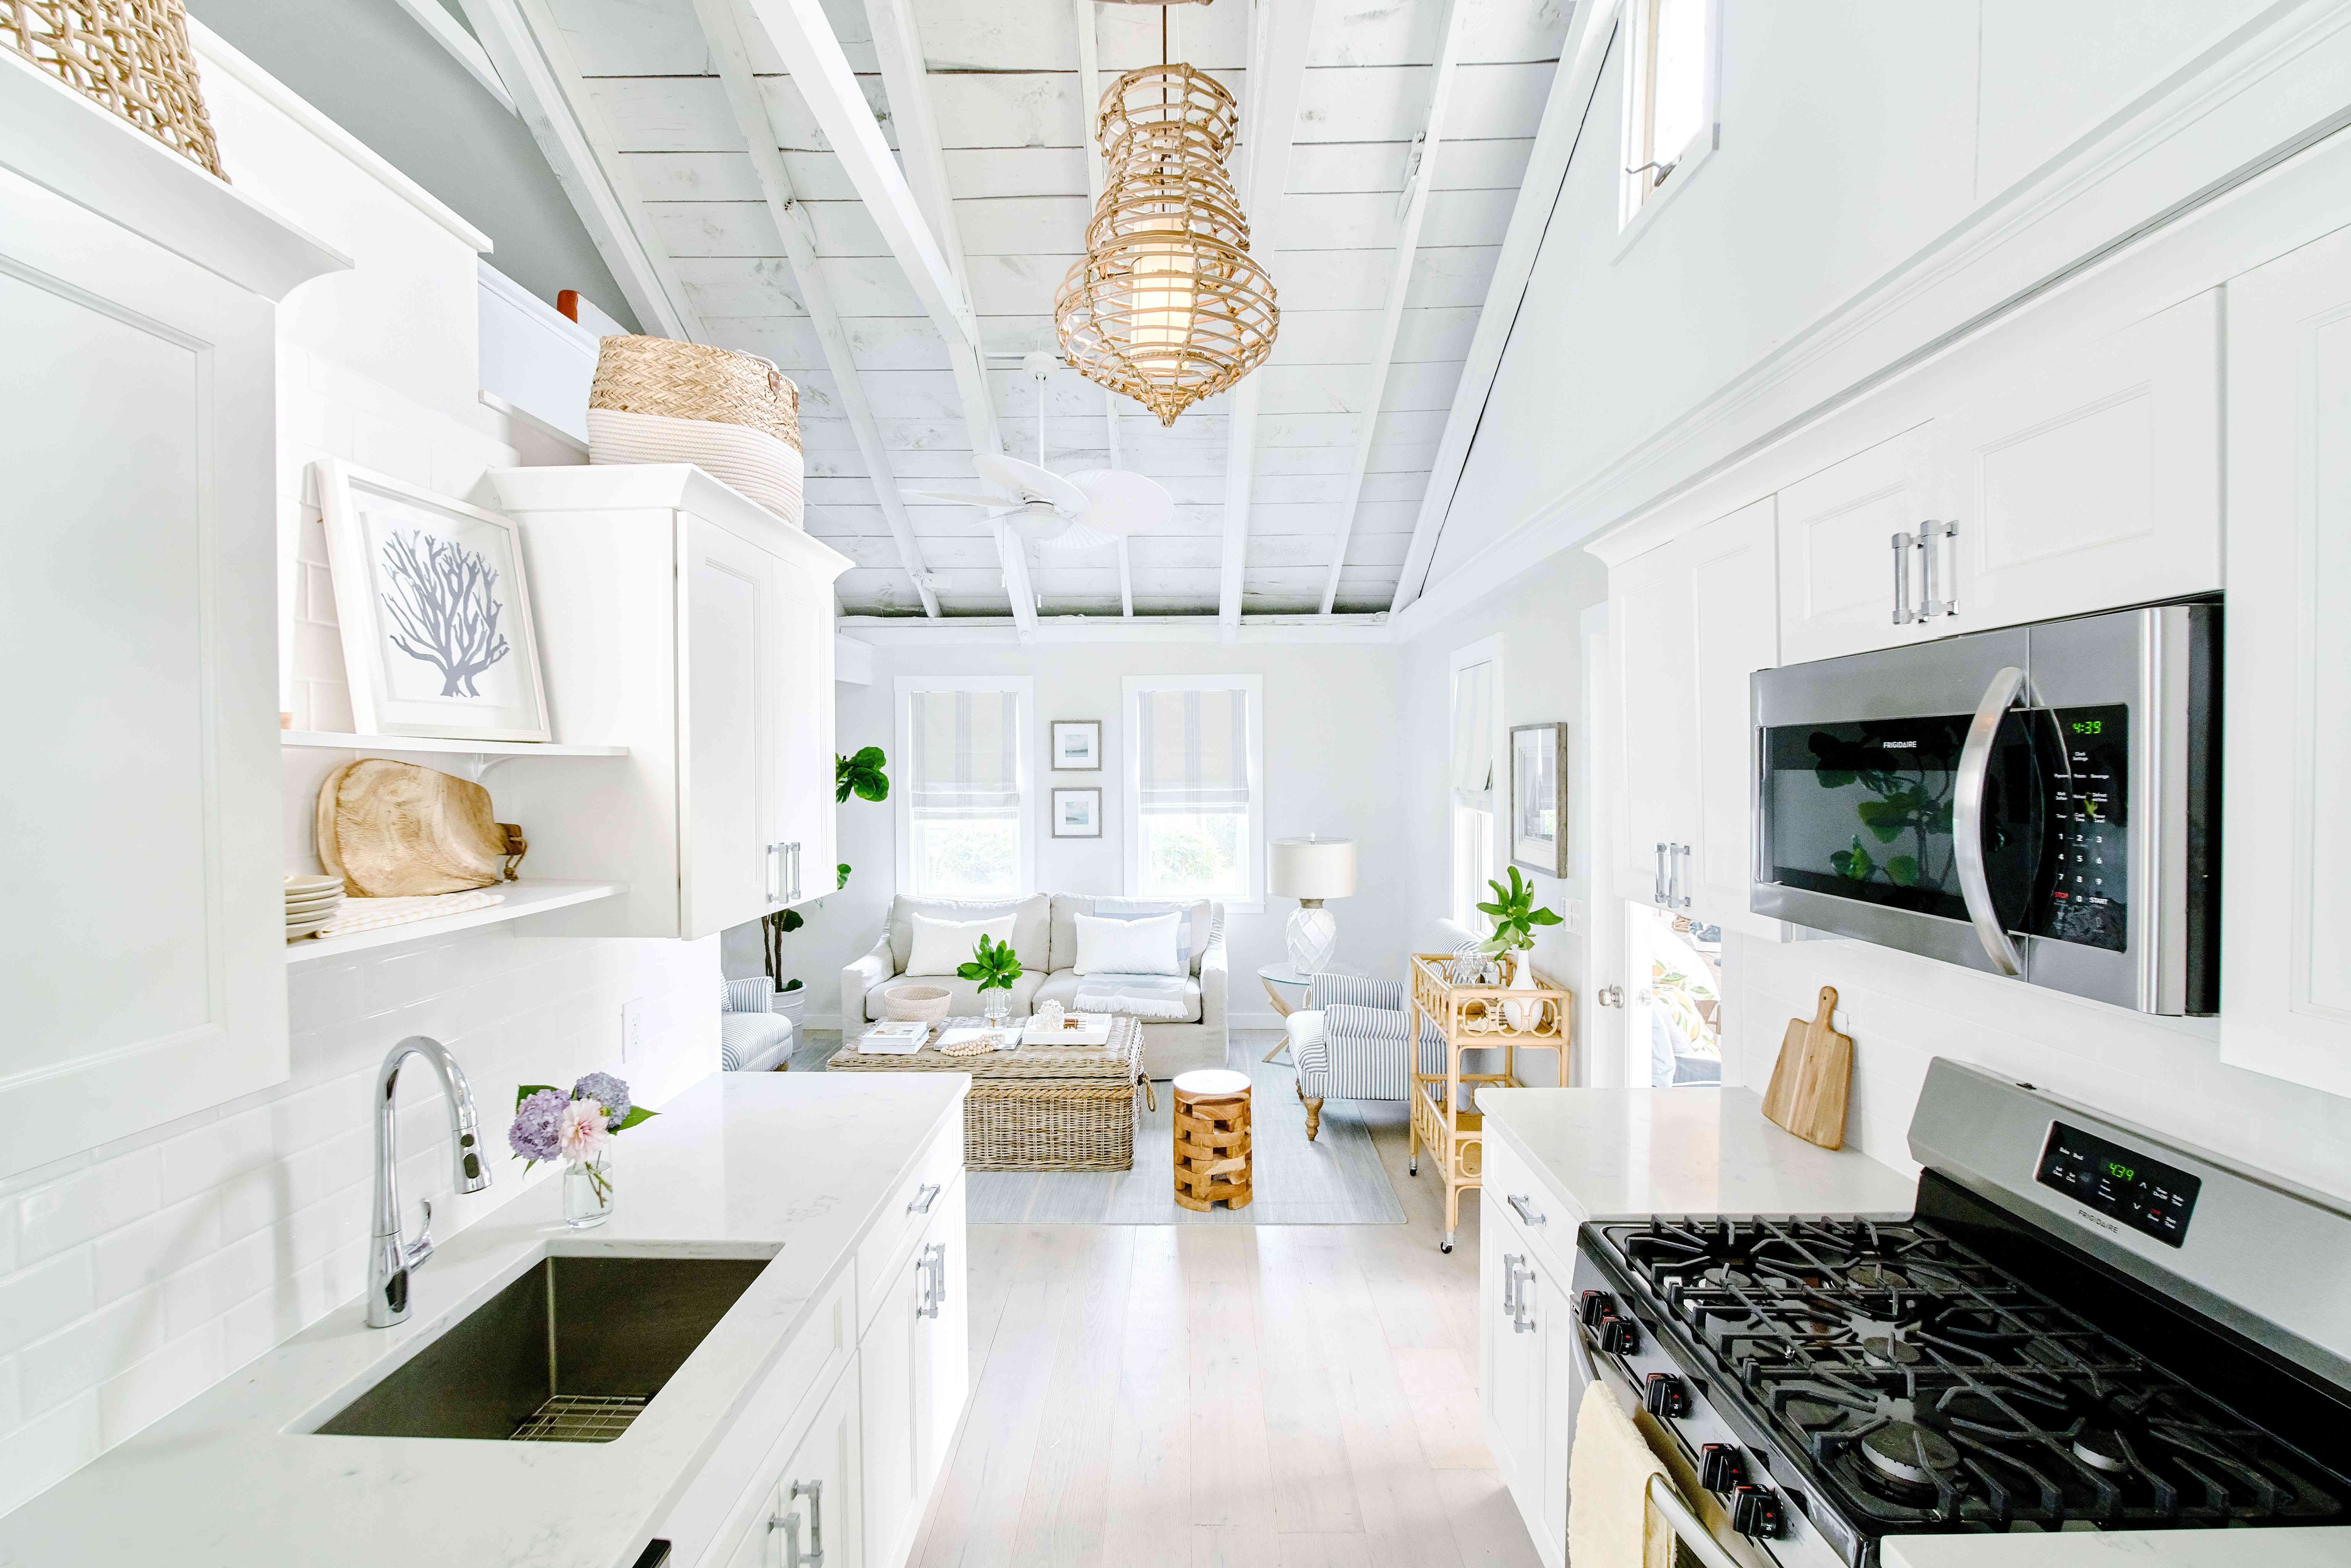 best kitchen ideas - all-white kitchen with beachy pendant lighting